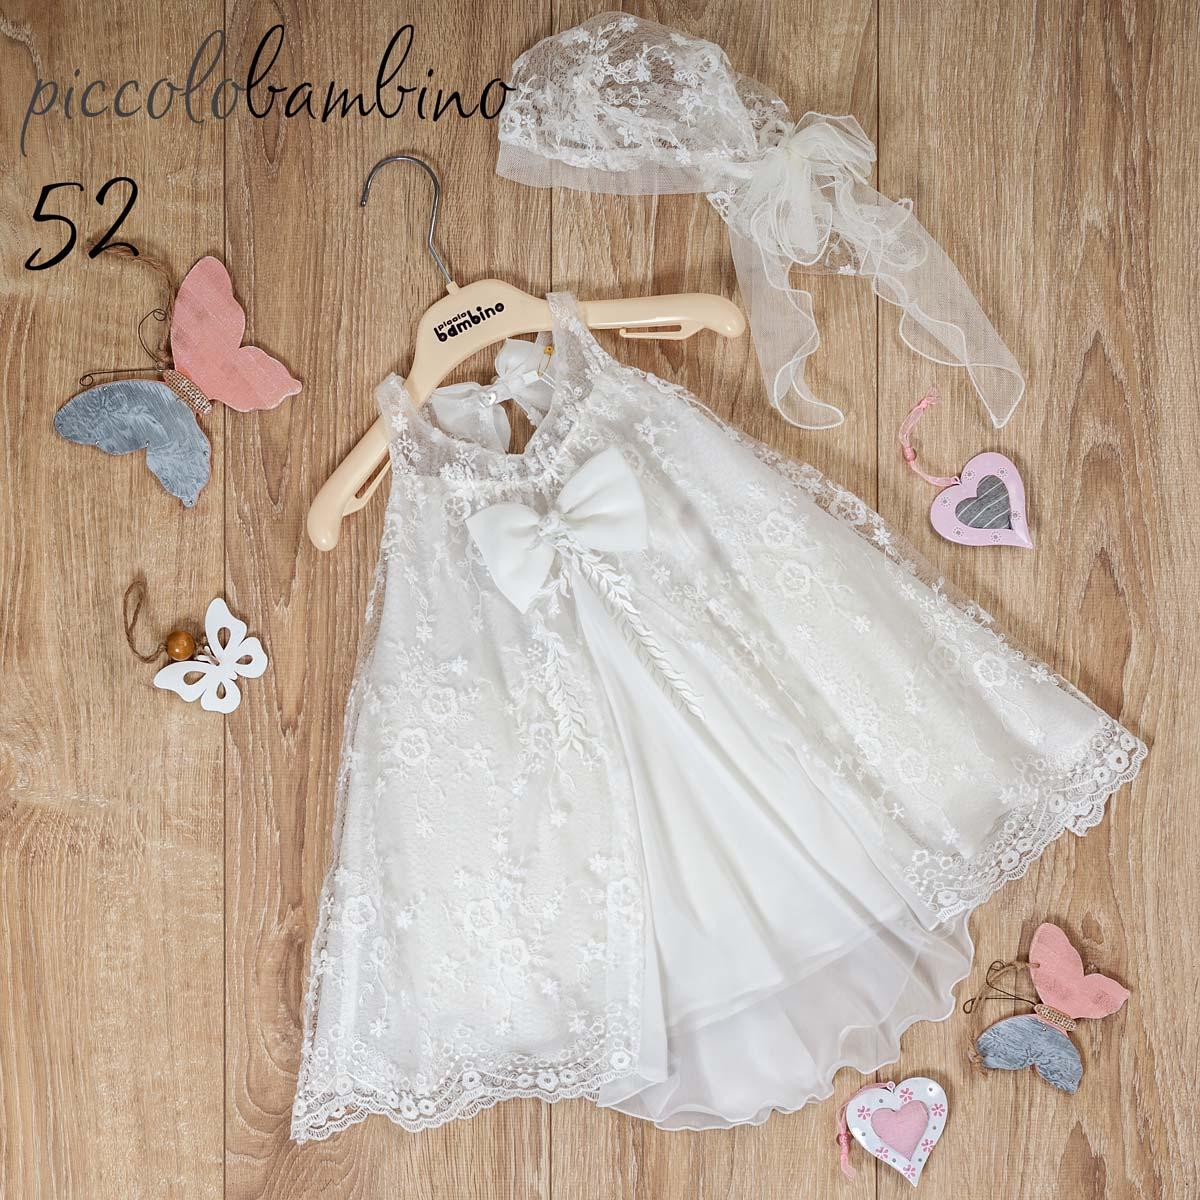 ea32d3e6862b Φορεματάκι Βάπτισης  52 - Βαπτιστικα Ιατριδης